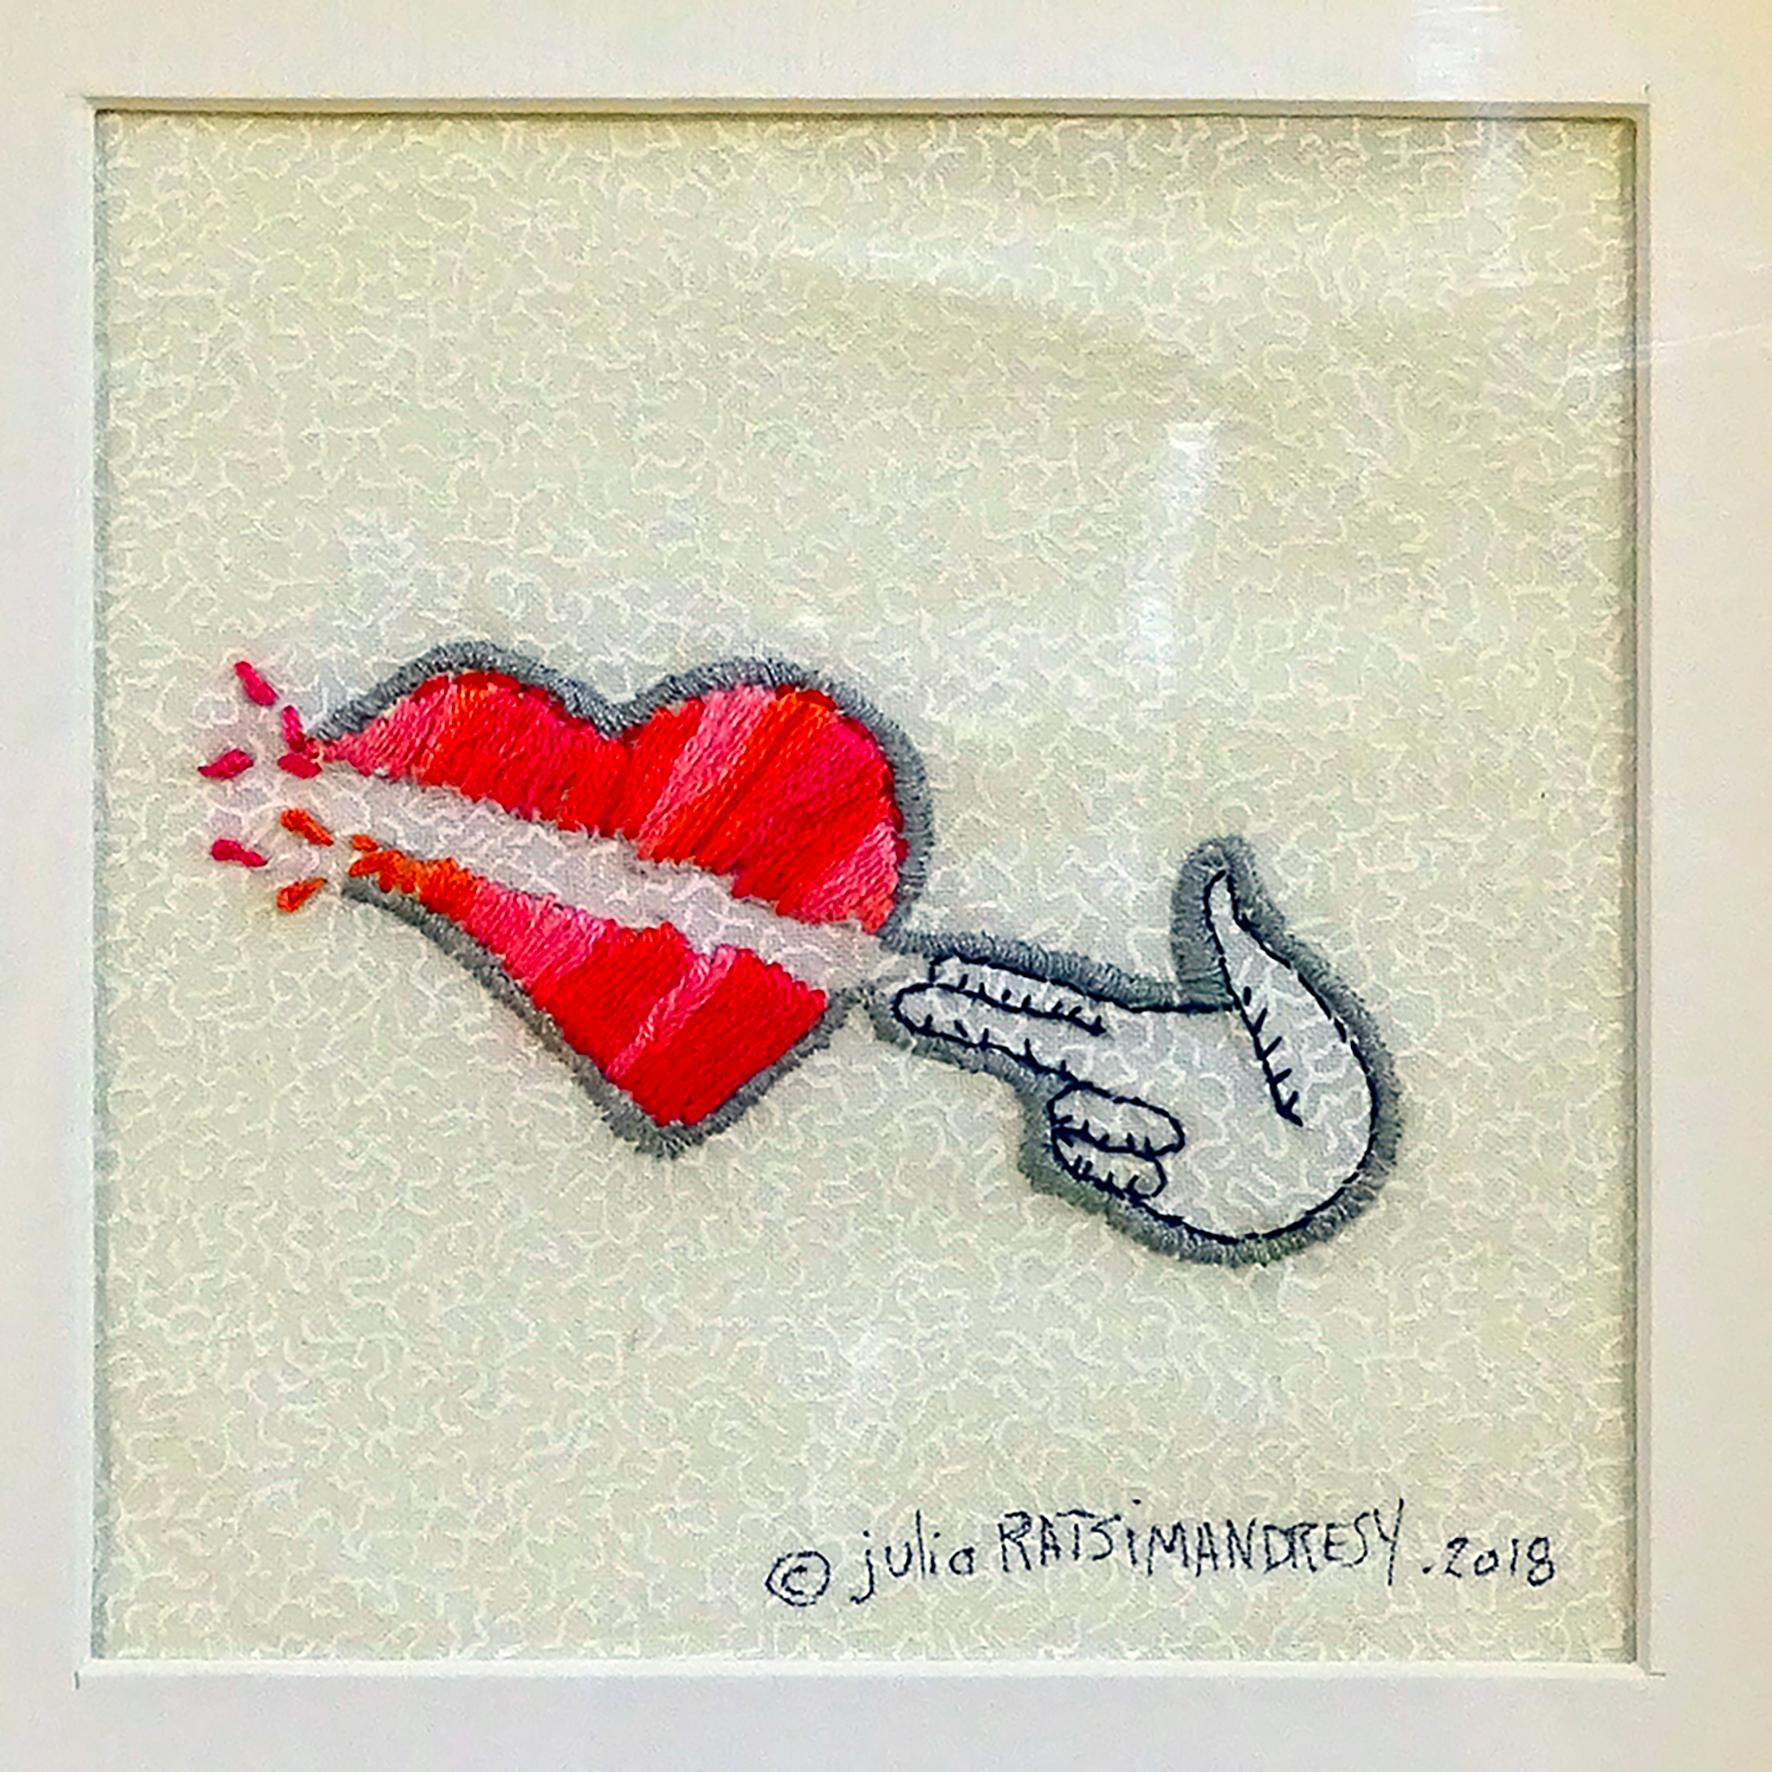 """Bang! Bang!"" ©Julia Ratsimandresy / Cadre bois+passe-partout papier+verre / 90€ hors fdp"